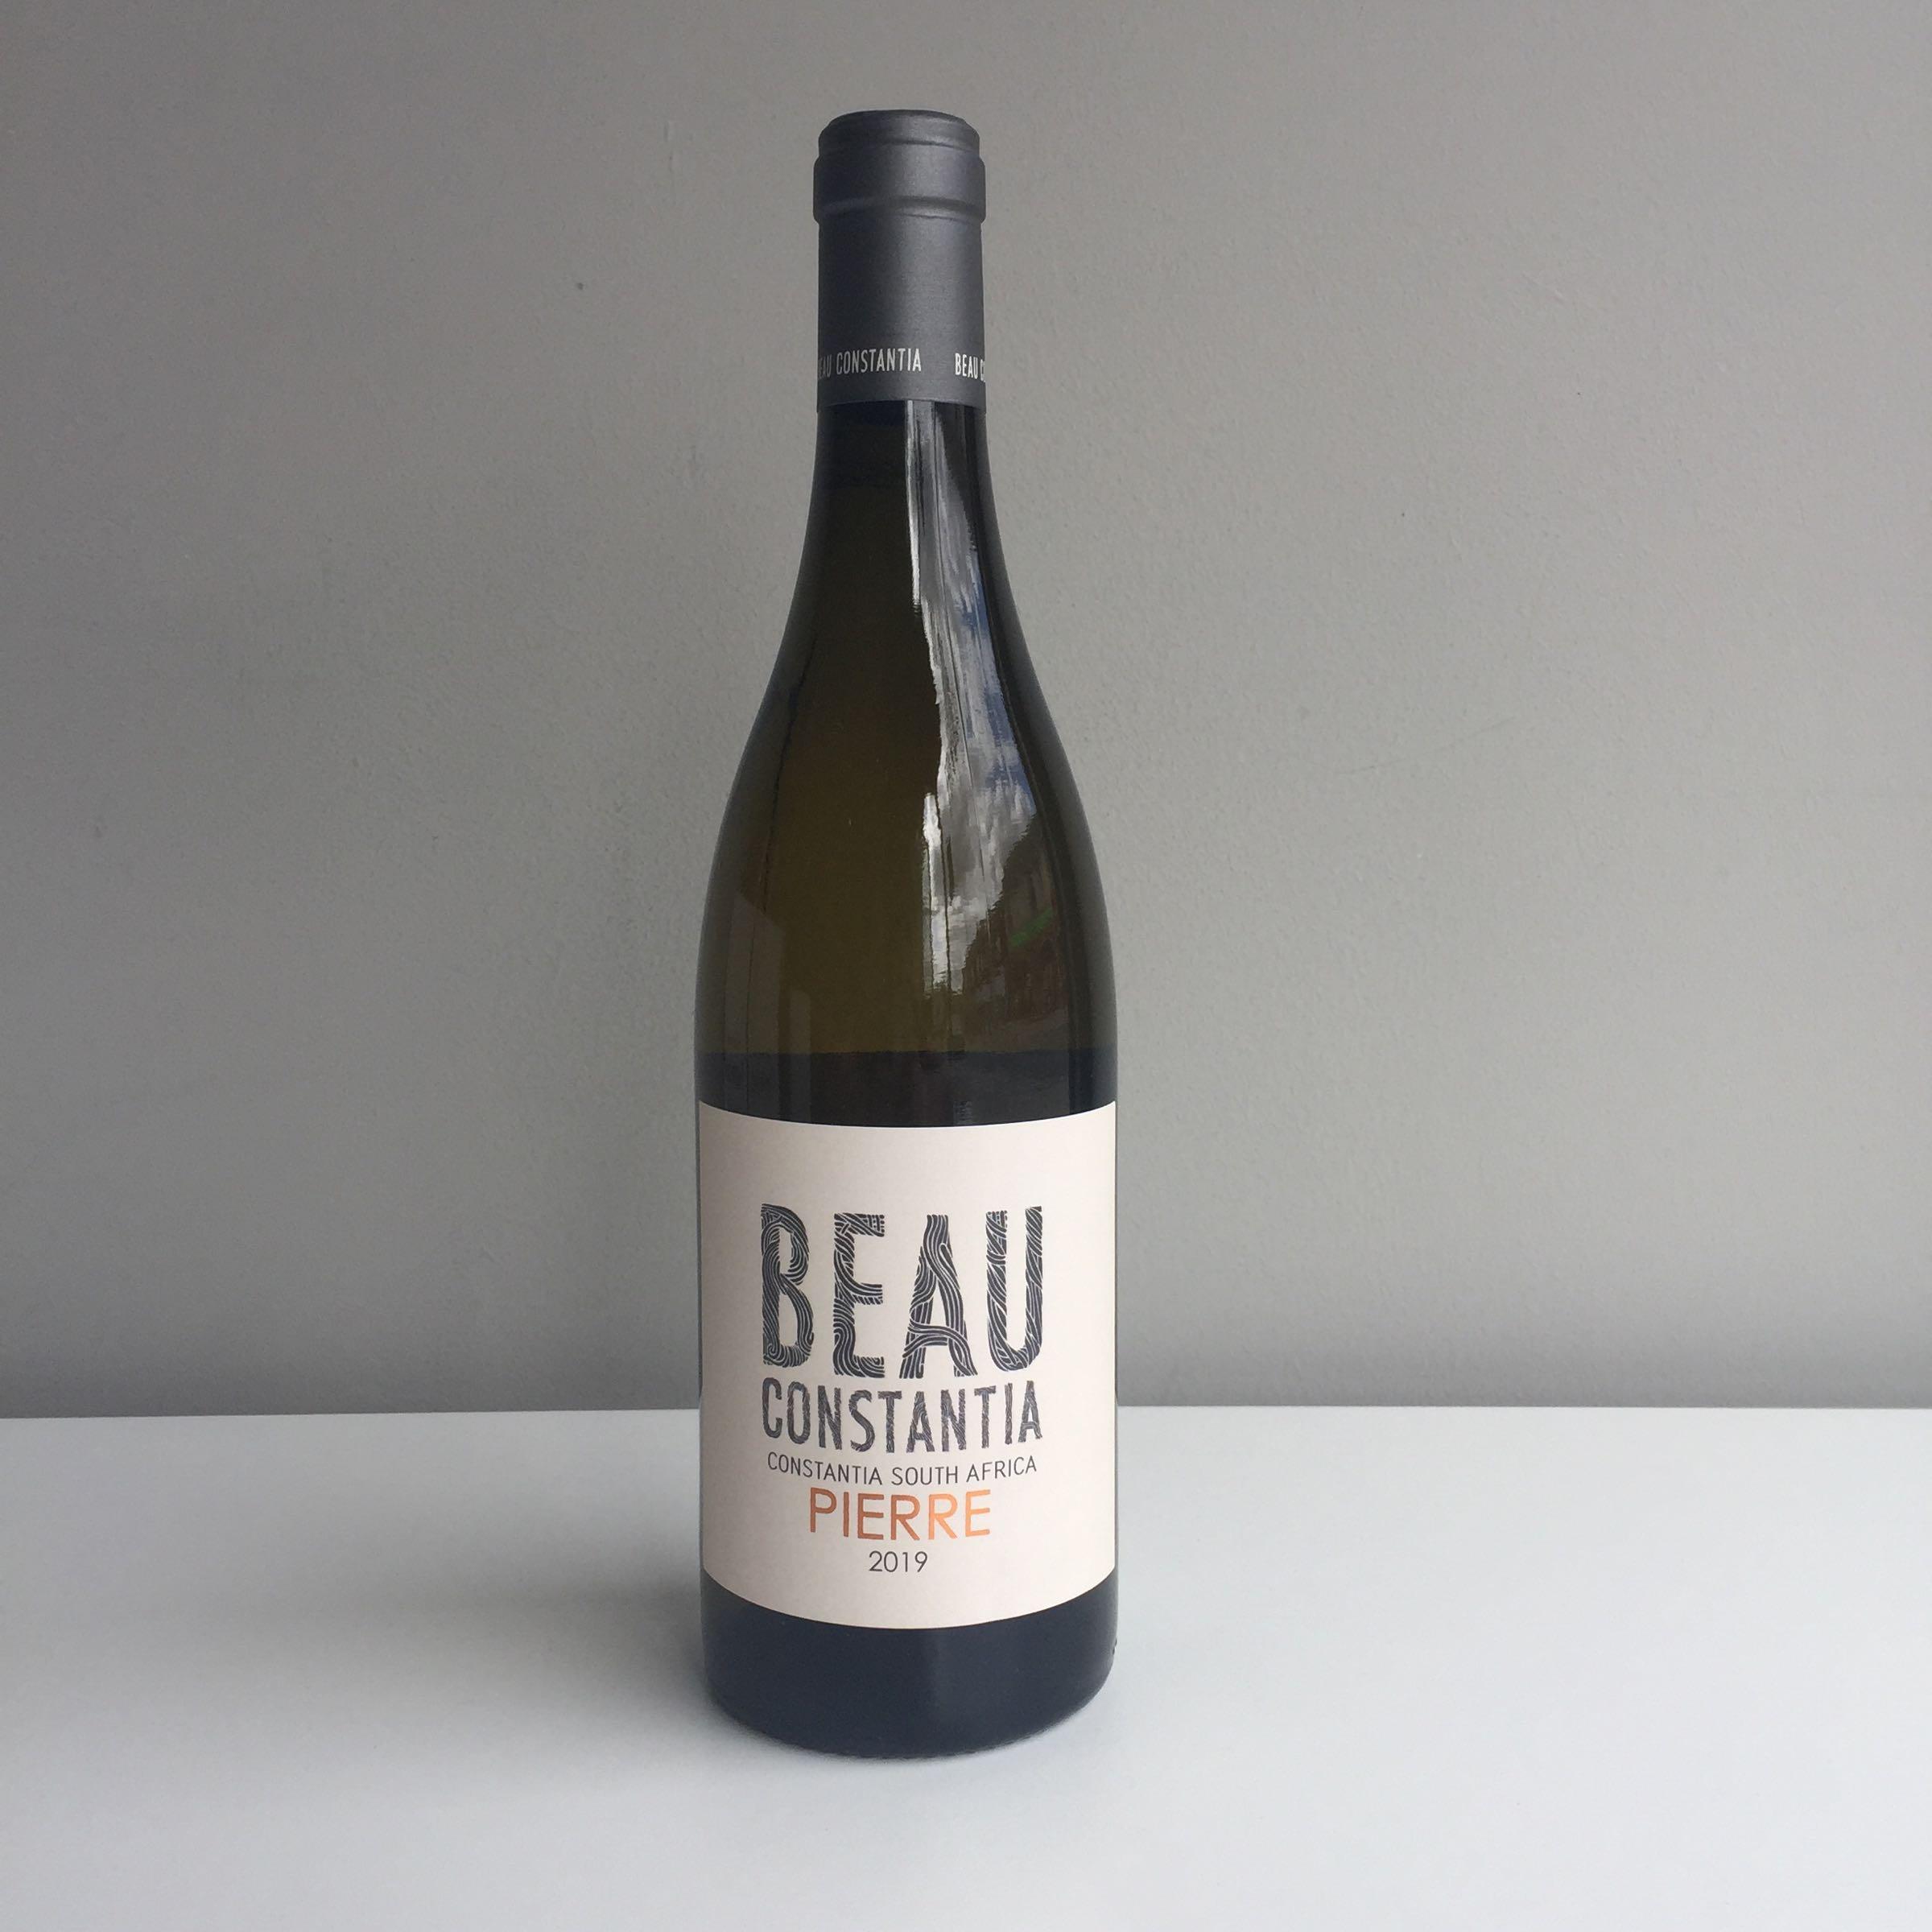 Beau Constantia 'Pierre' Sauvignon Blanc, Semillon